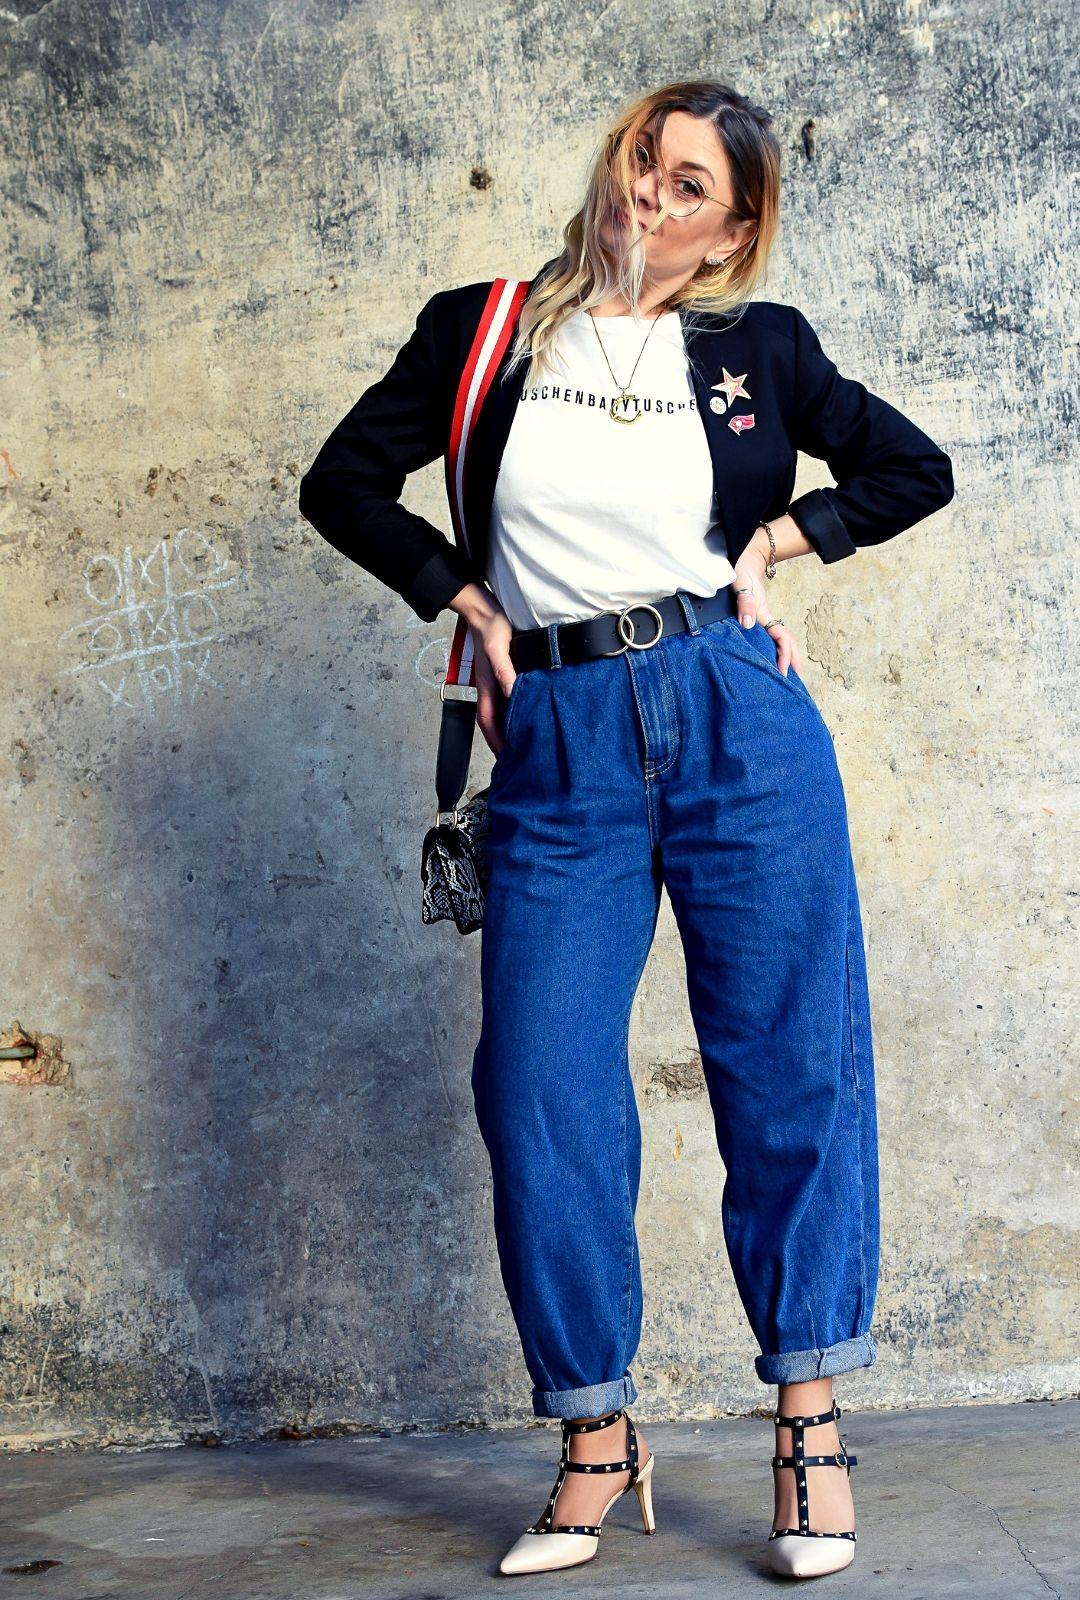 Slouchy-Jeans-kombinieren-1